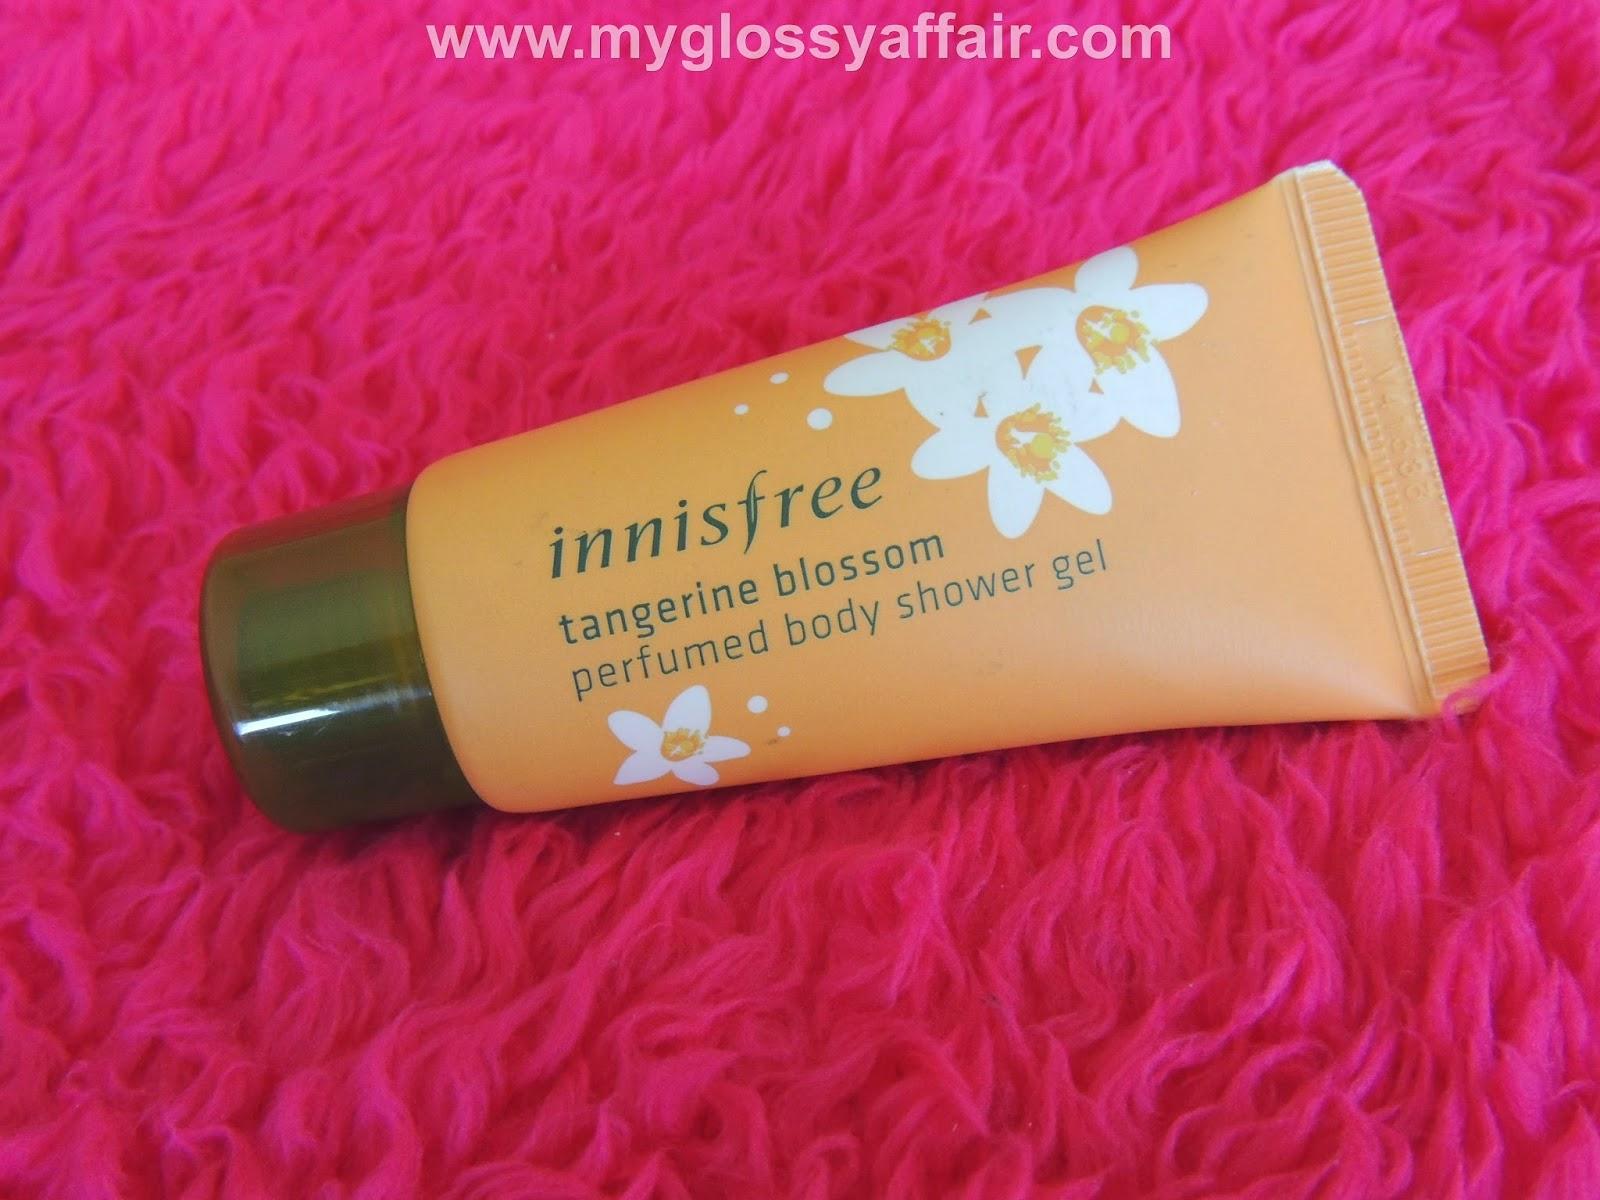 Innisfree tangerine blossom perfumed body shower gel